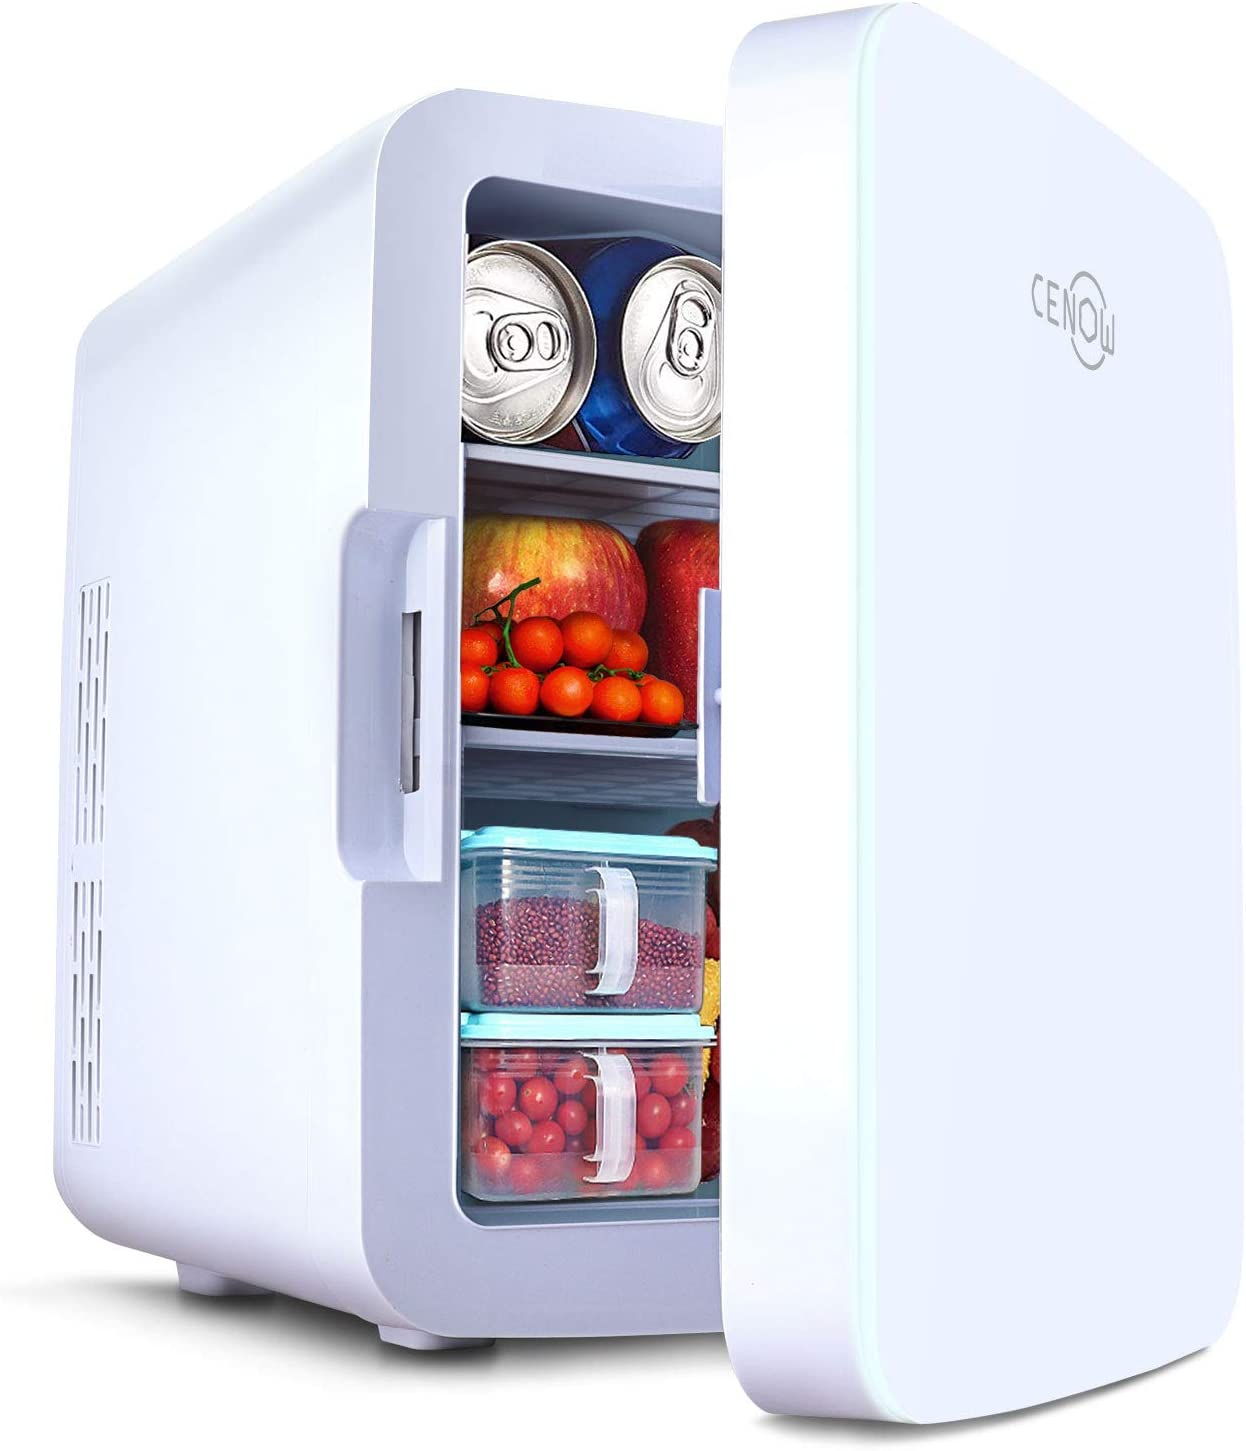 Mini fridge for bedroom, 10 Liter/12 Can Portable Mini skincare fridge, Car fridge Cooler and Warmer with 110V AC/12V DC, Personal Mini fridge for skin care, Food, Medications, Home & Travel (White, 10L)